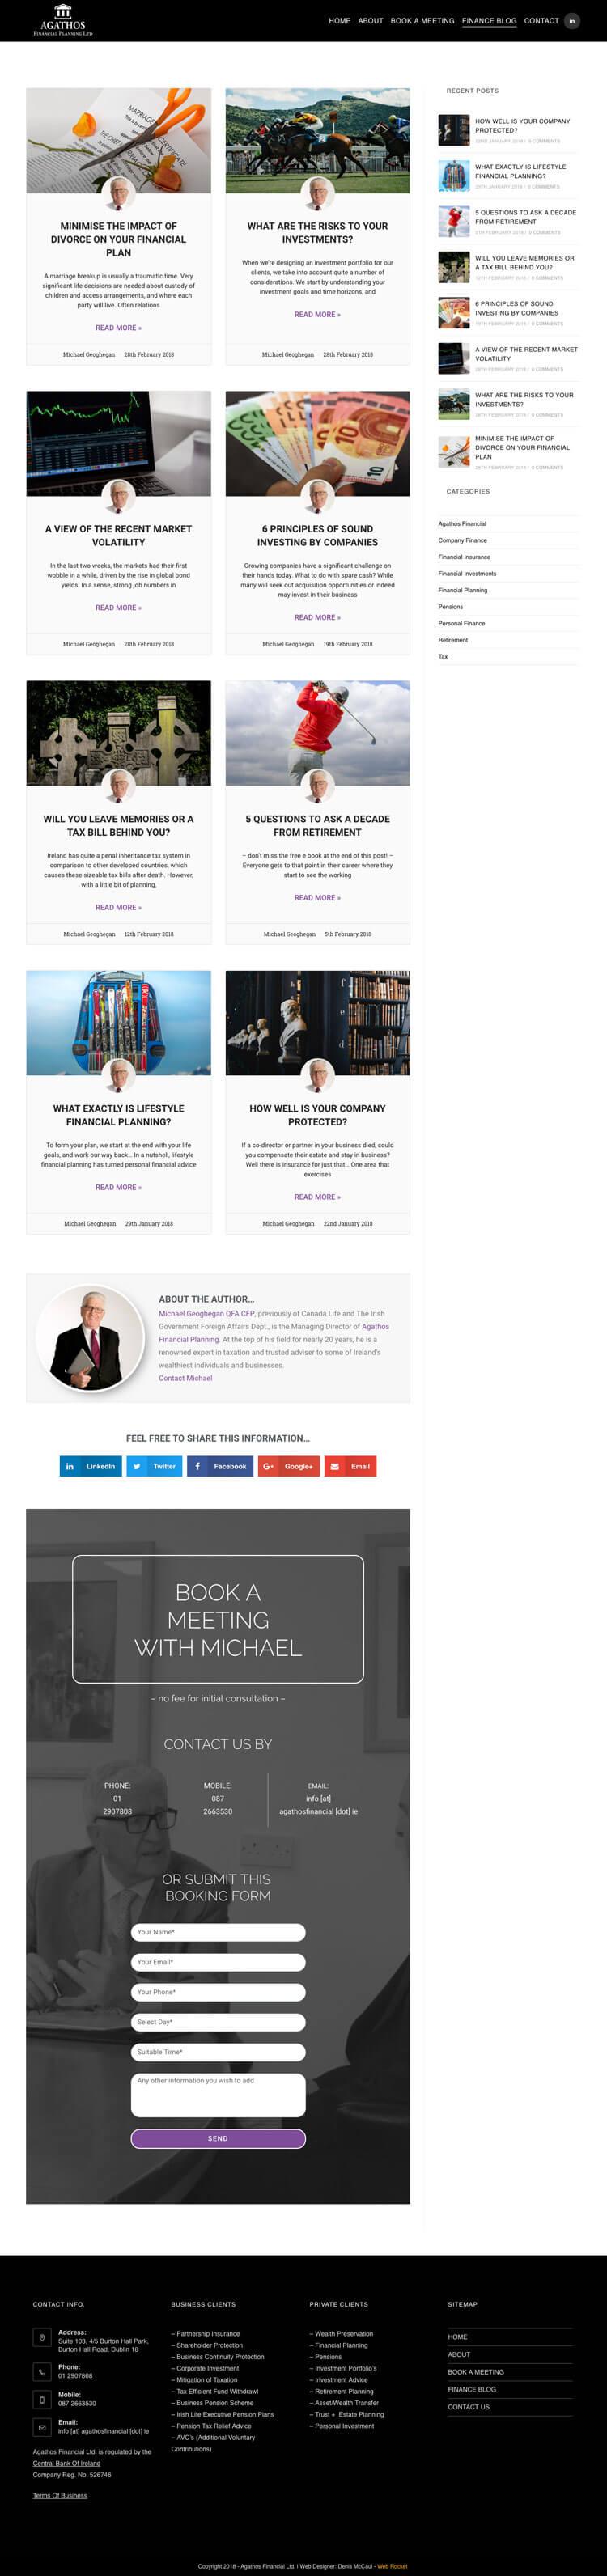 blog page 1.jpg